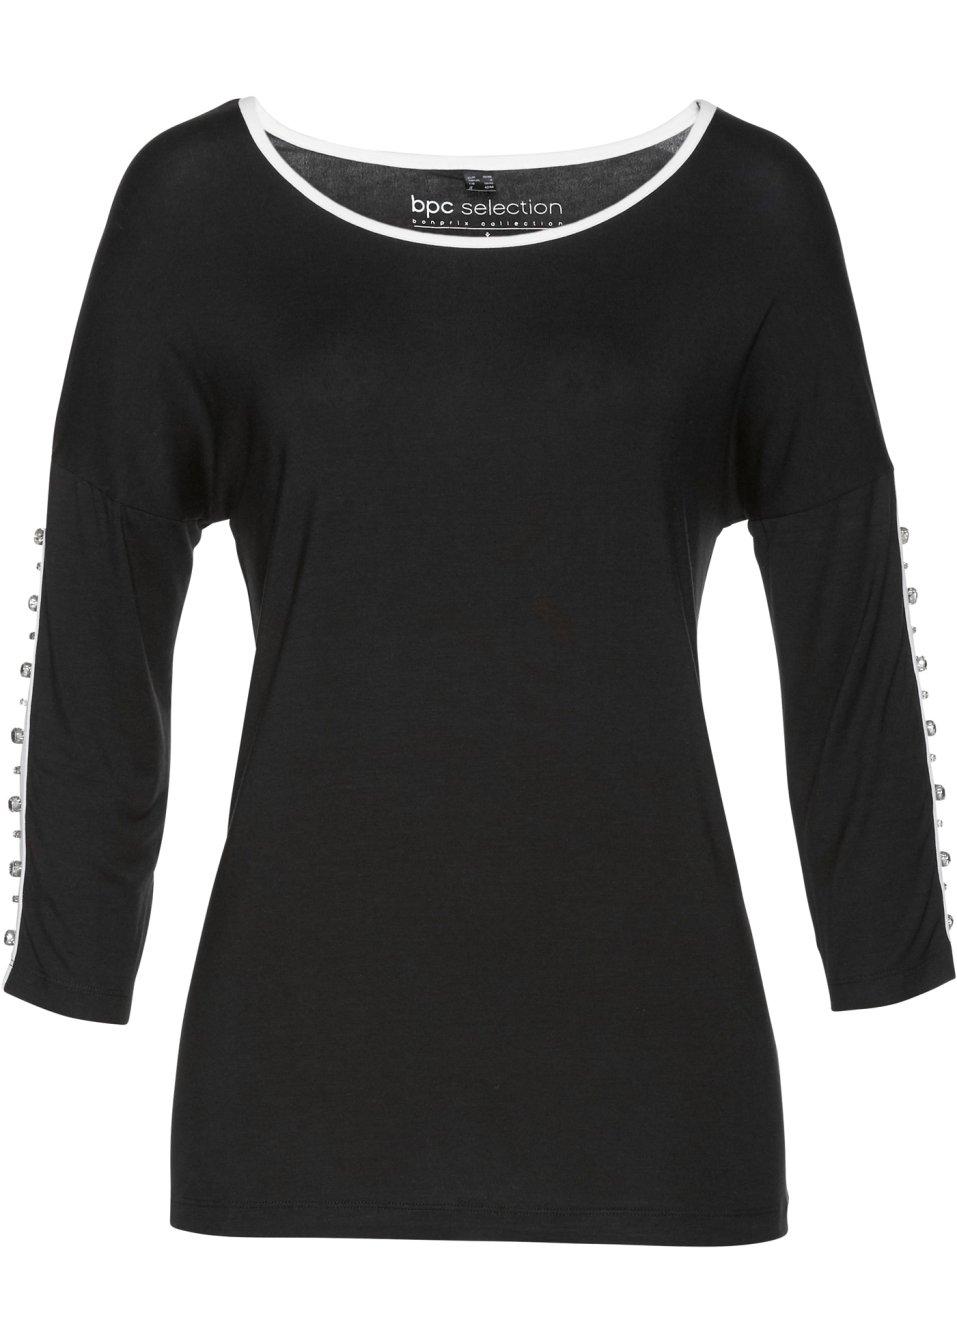 Shirt schwarz/weiß/silber - Damen - bonprix.de nihfQ UCQHb